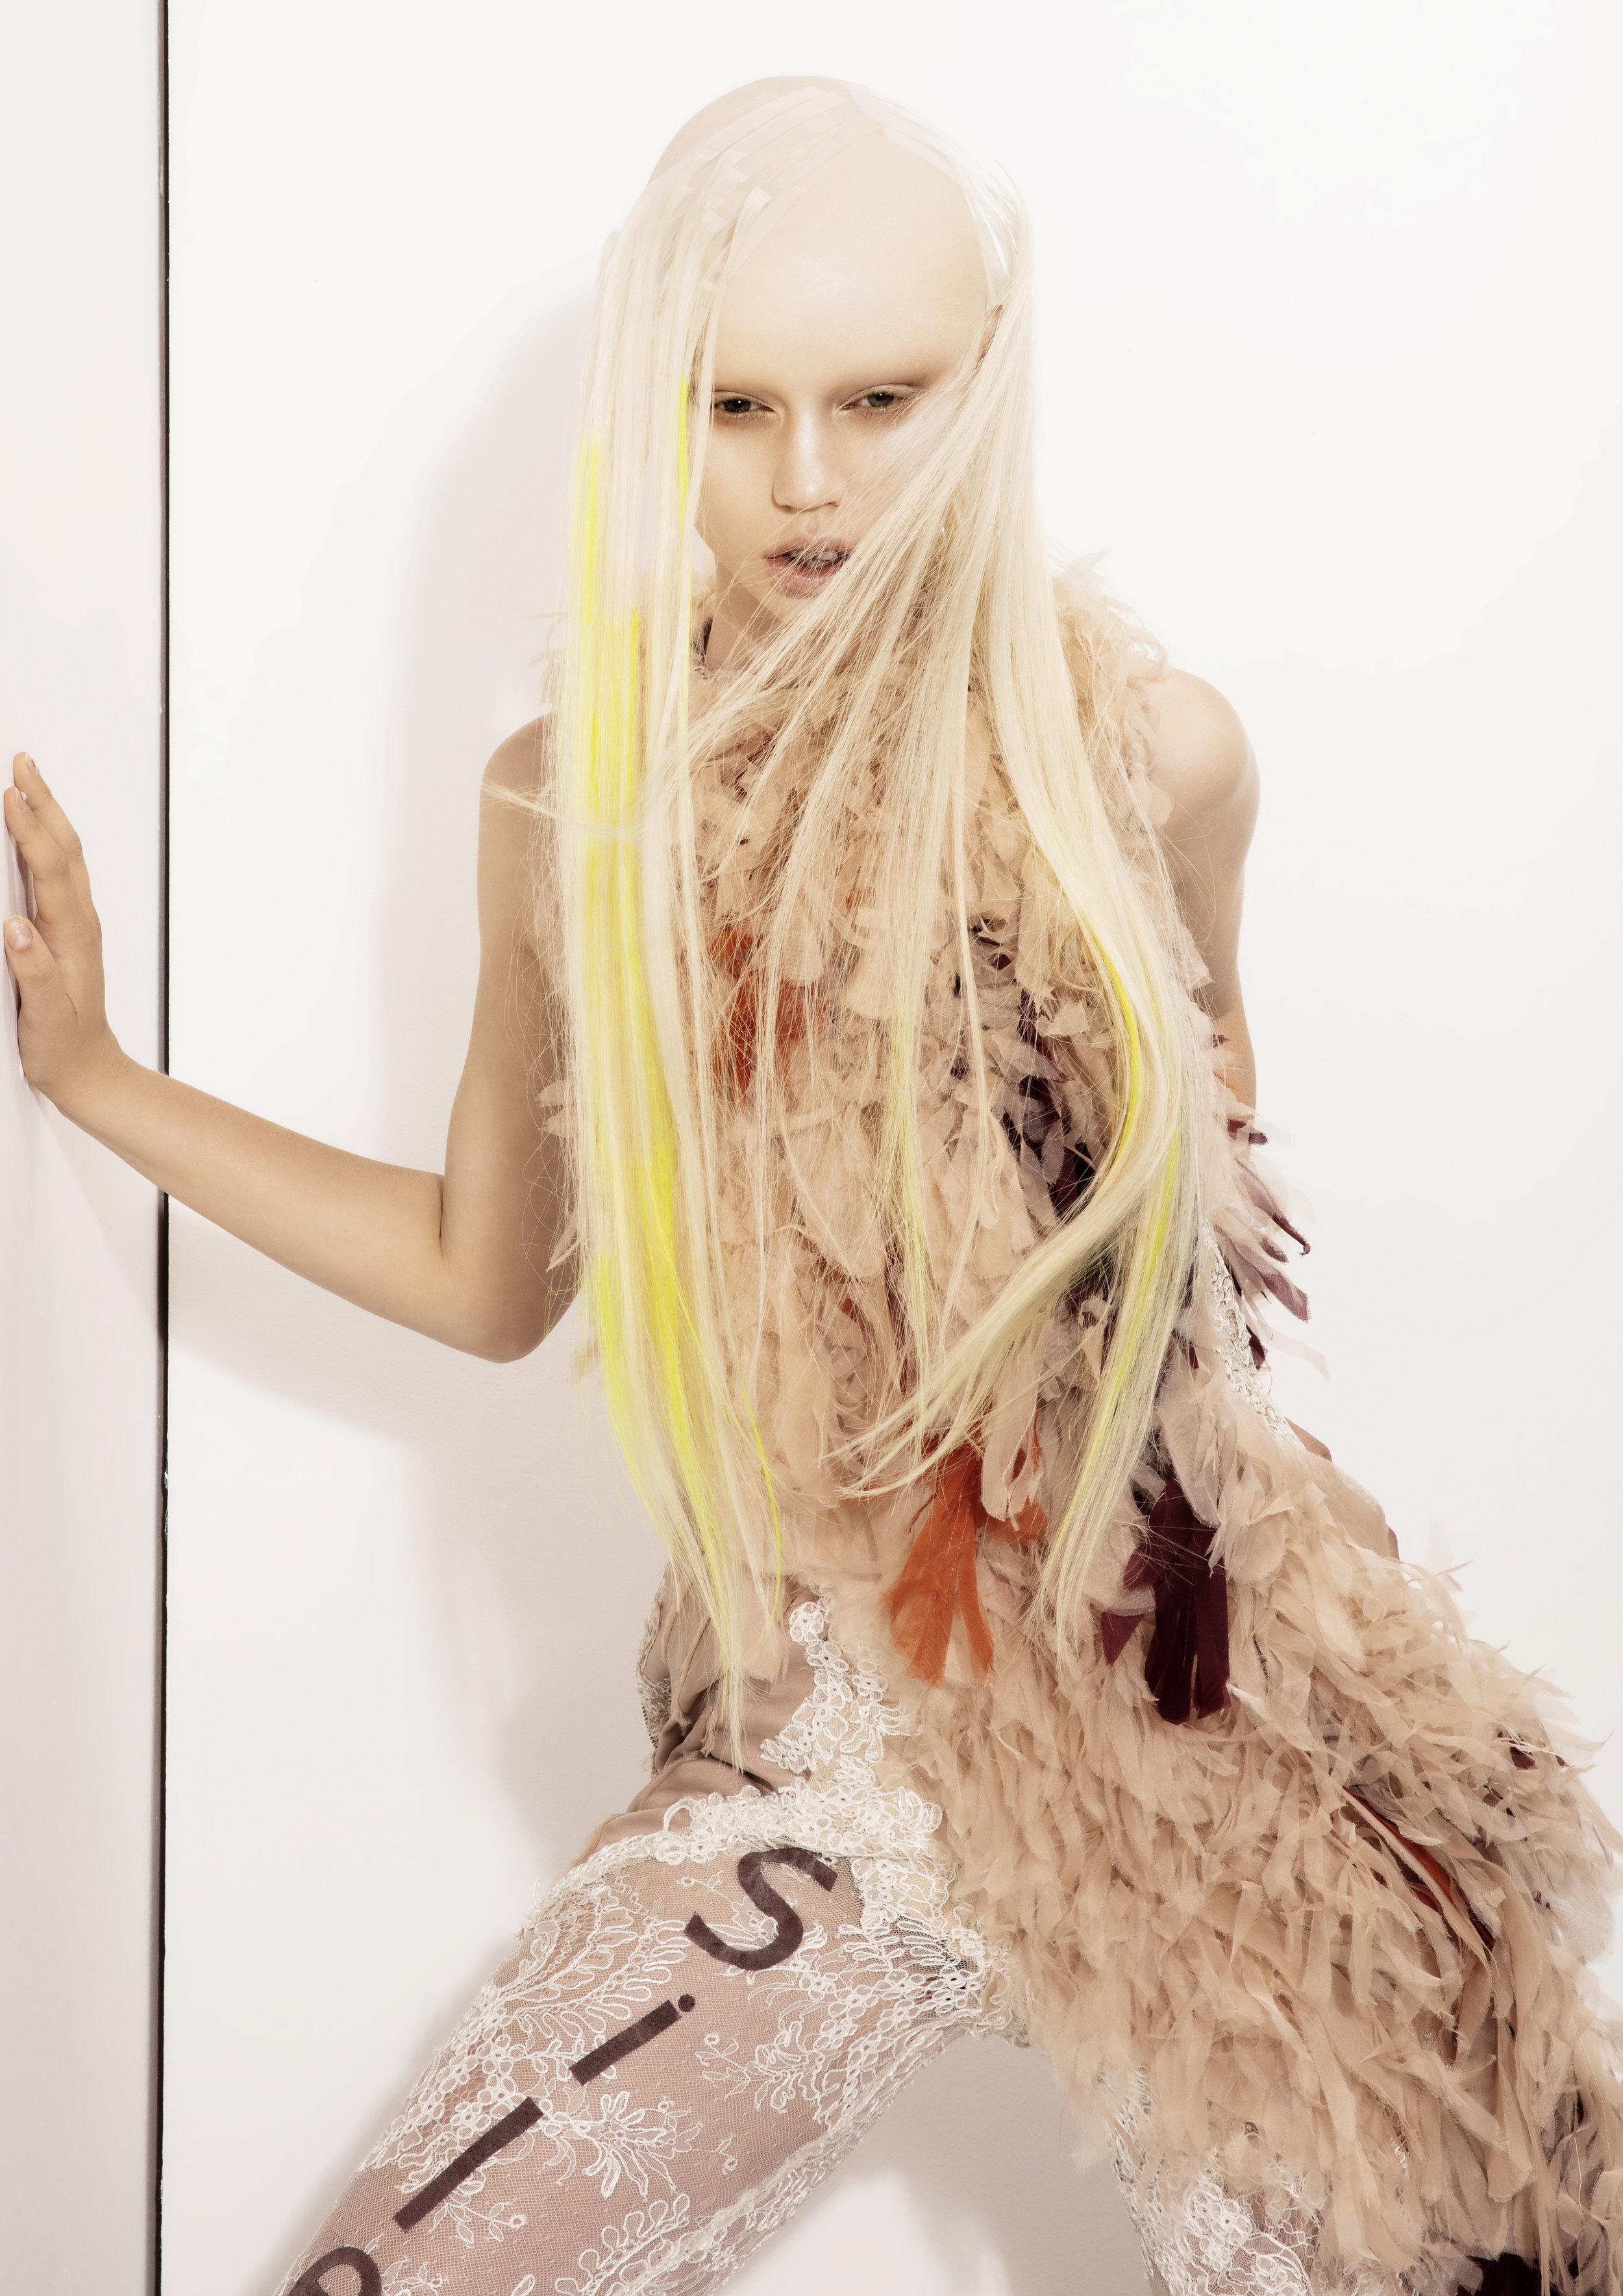 Vic_HairDresseroftheYear_CristinaTatasciore_HiRRes-5.jpg